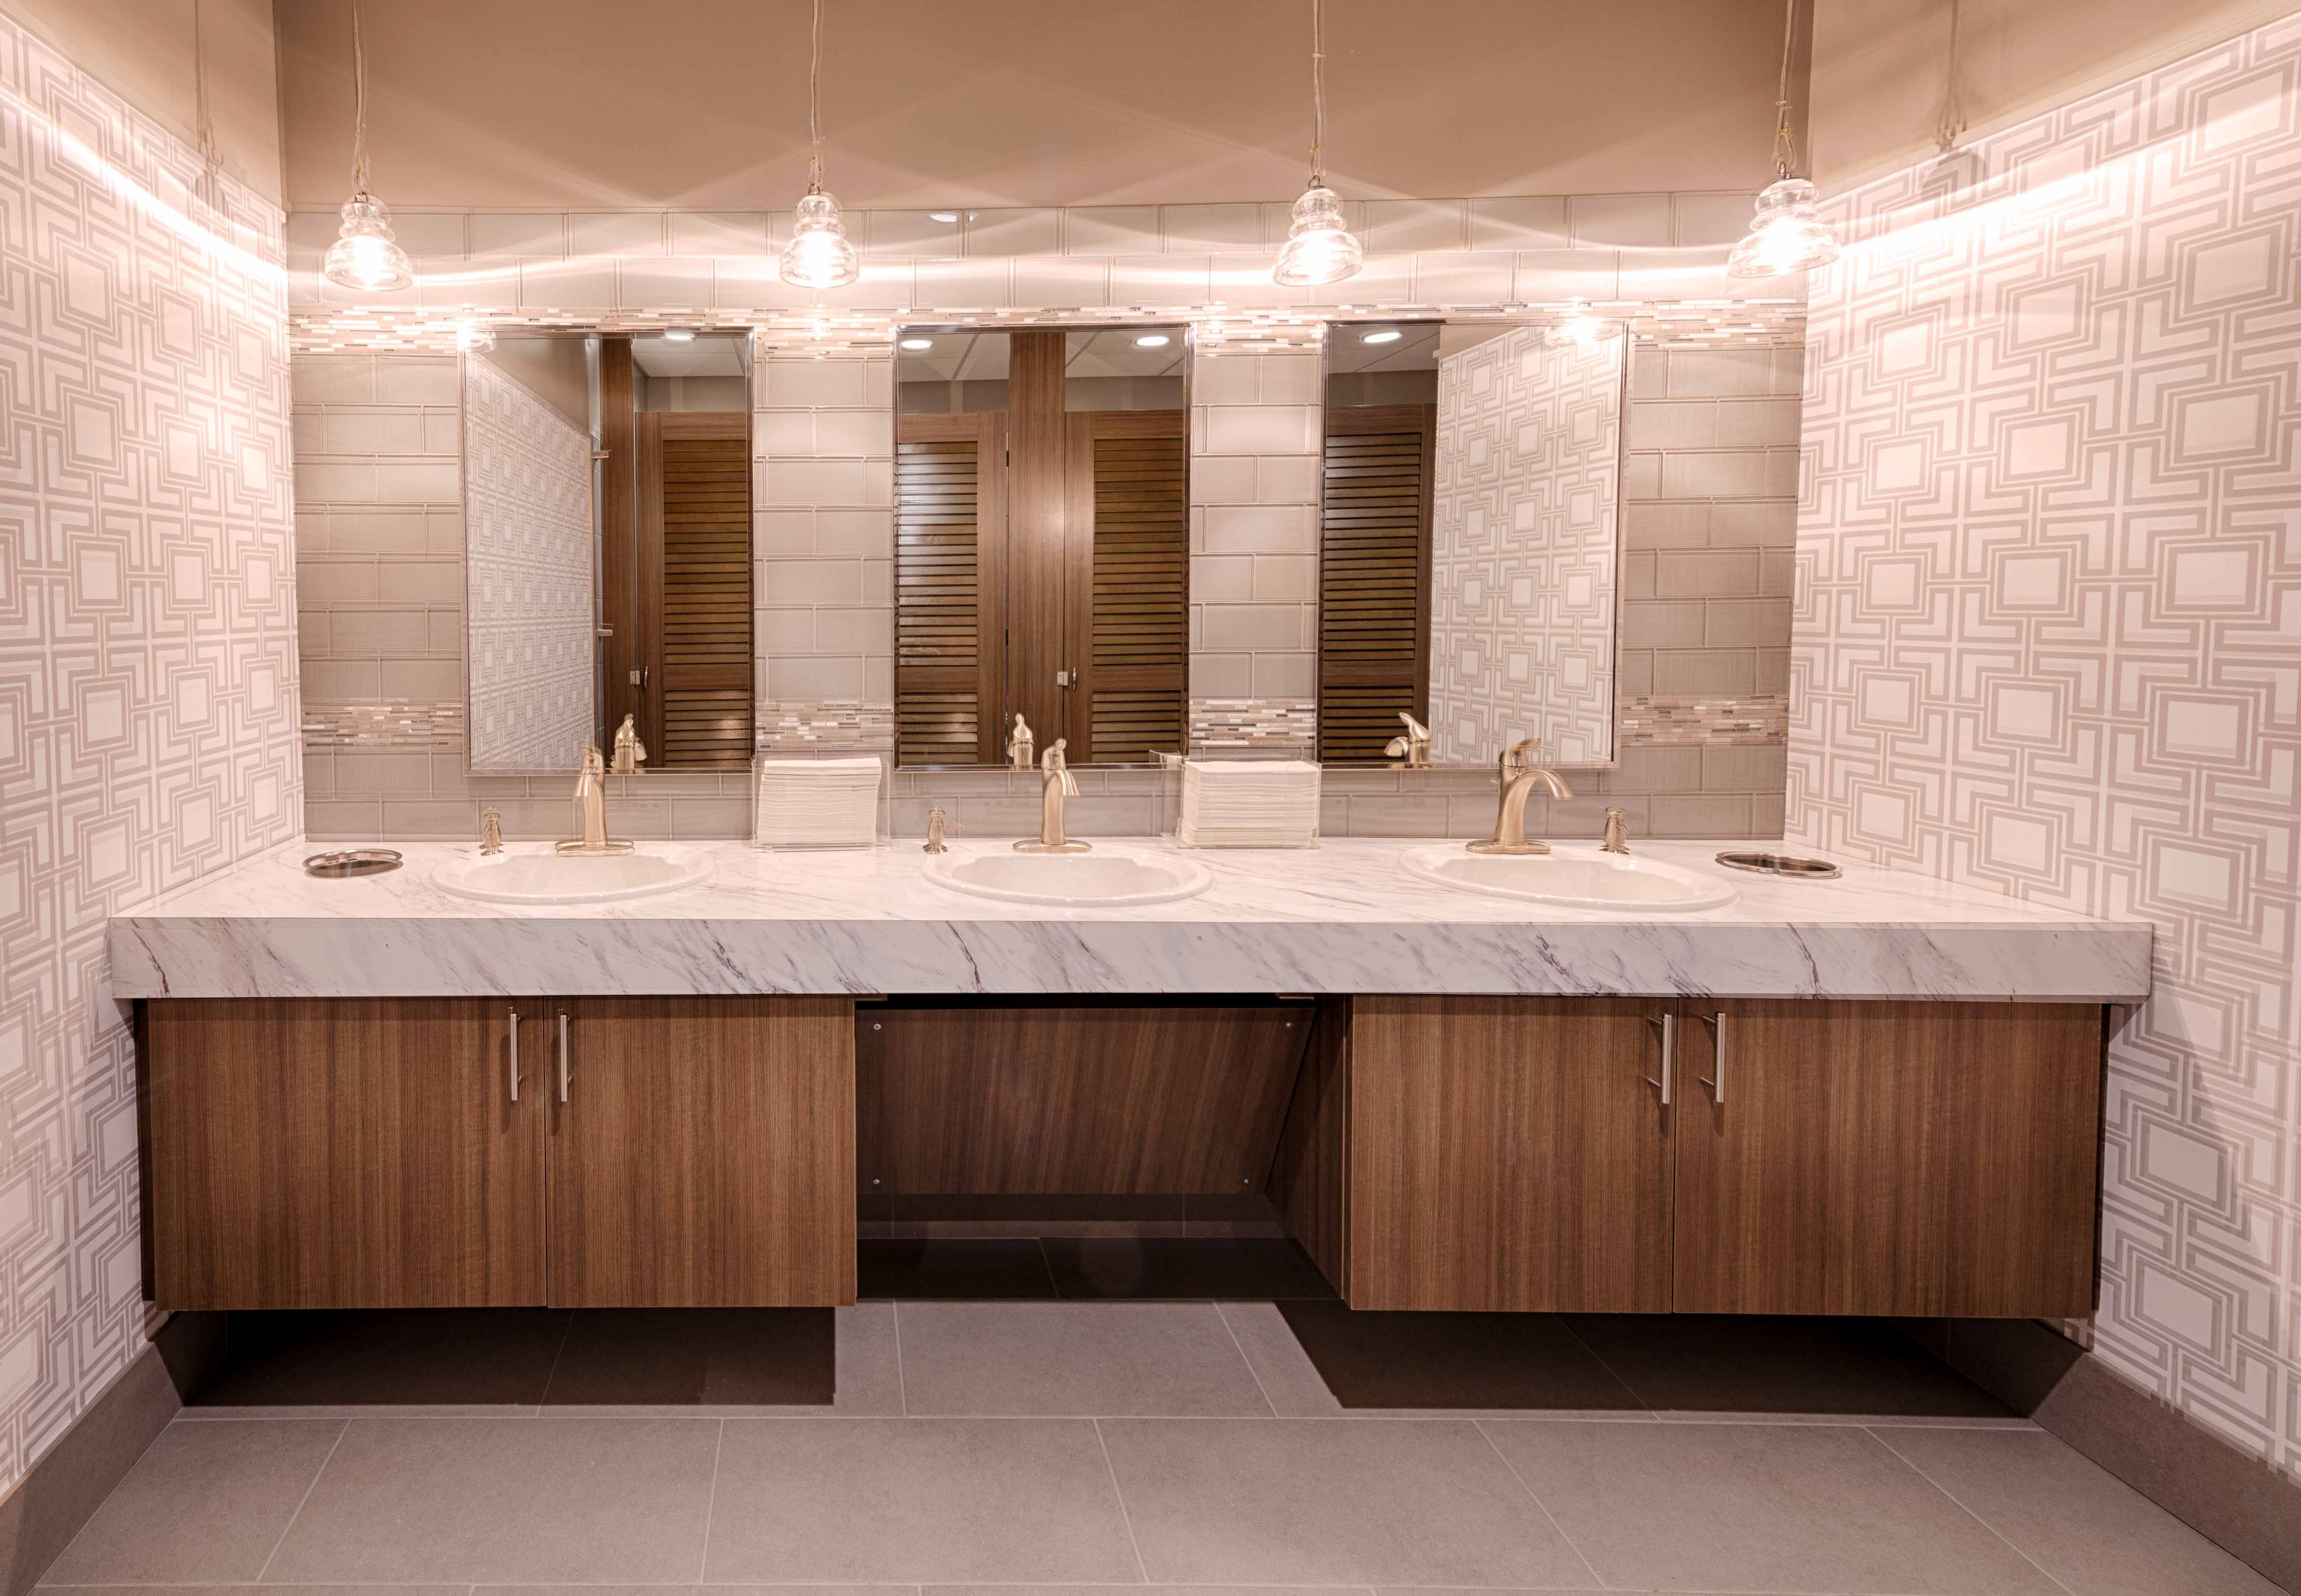 public bathroom doors. Ironwood Manufactured Toilet Partitions And Classic Louvered Bathroom Doors. Beautiful, Upscale Public Restroom Stalls Doors